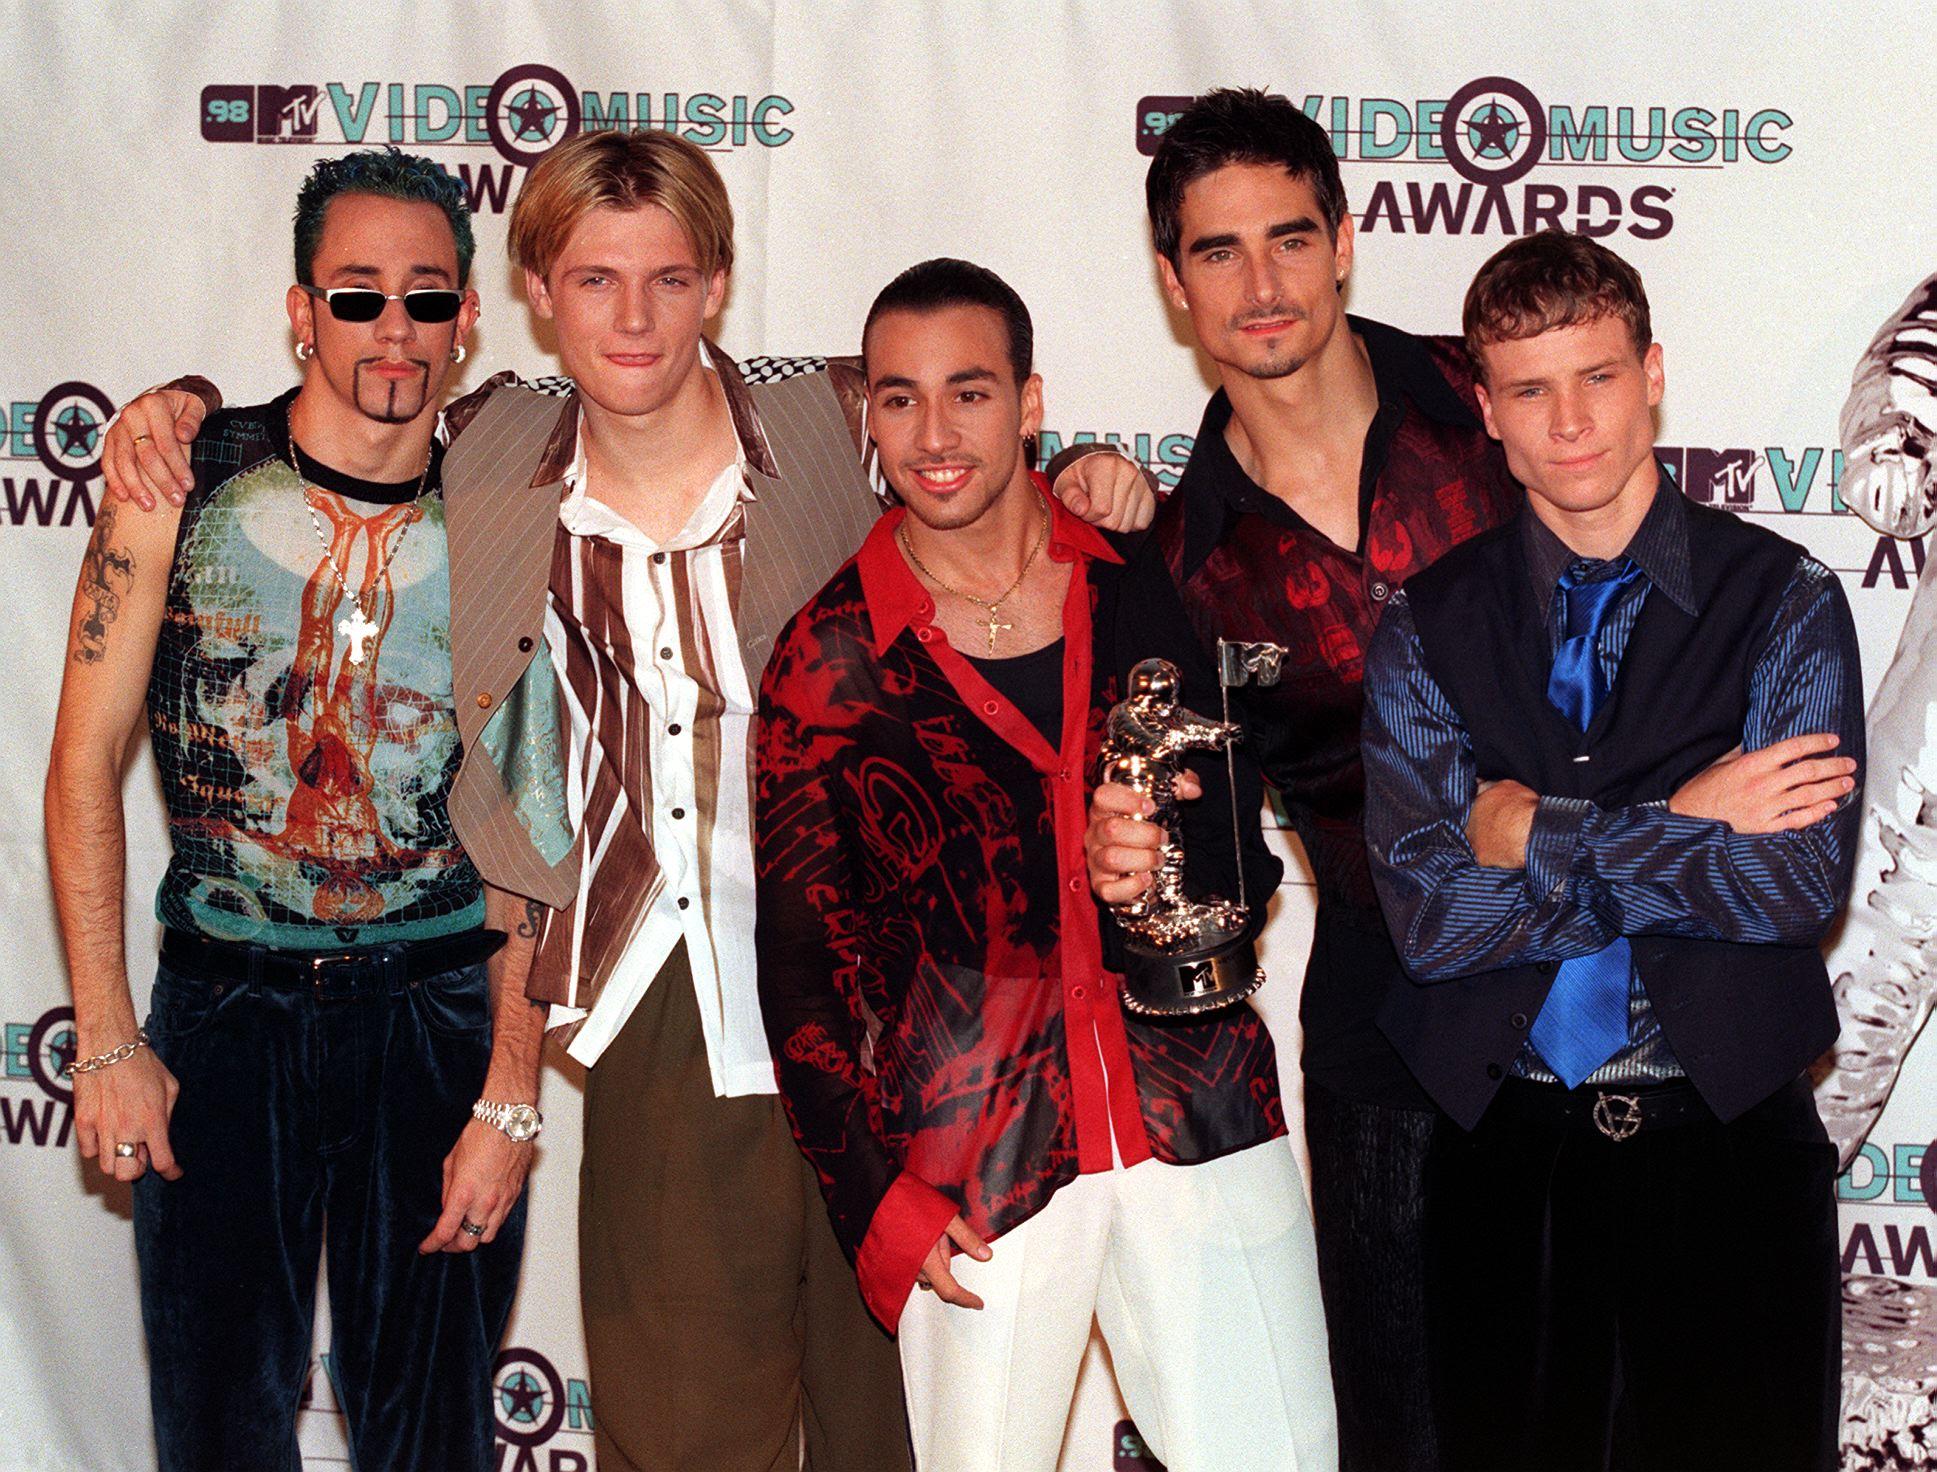 Members of the musical group Backstreet Boys pose